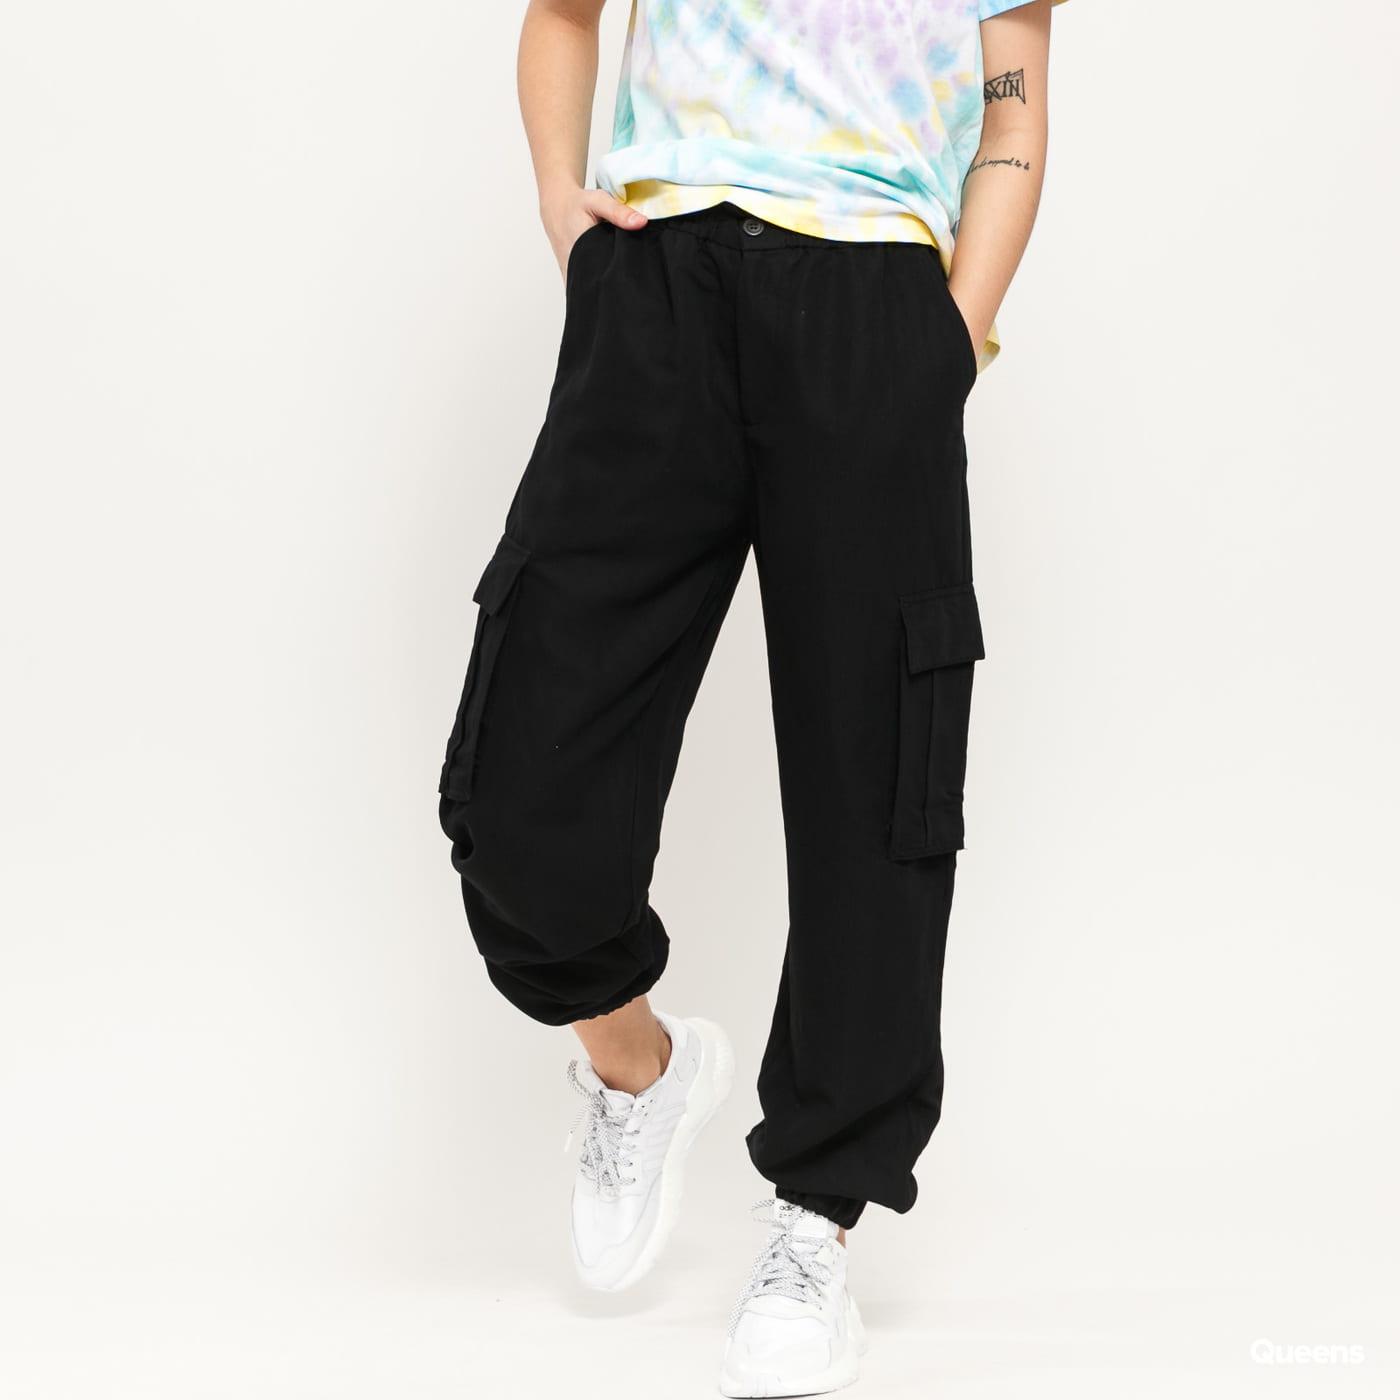 Urban Classics Ladies Viscose Twill Cargo Pants černé